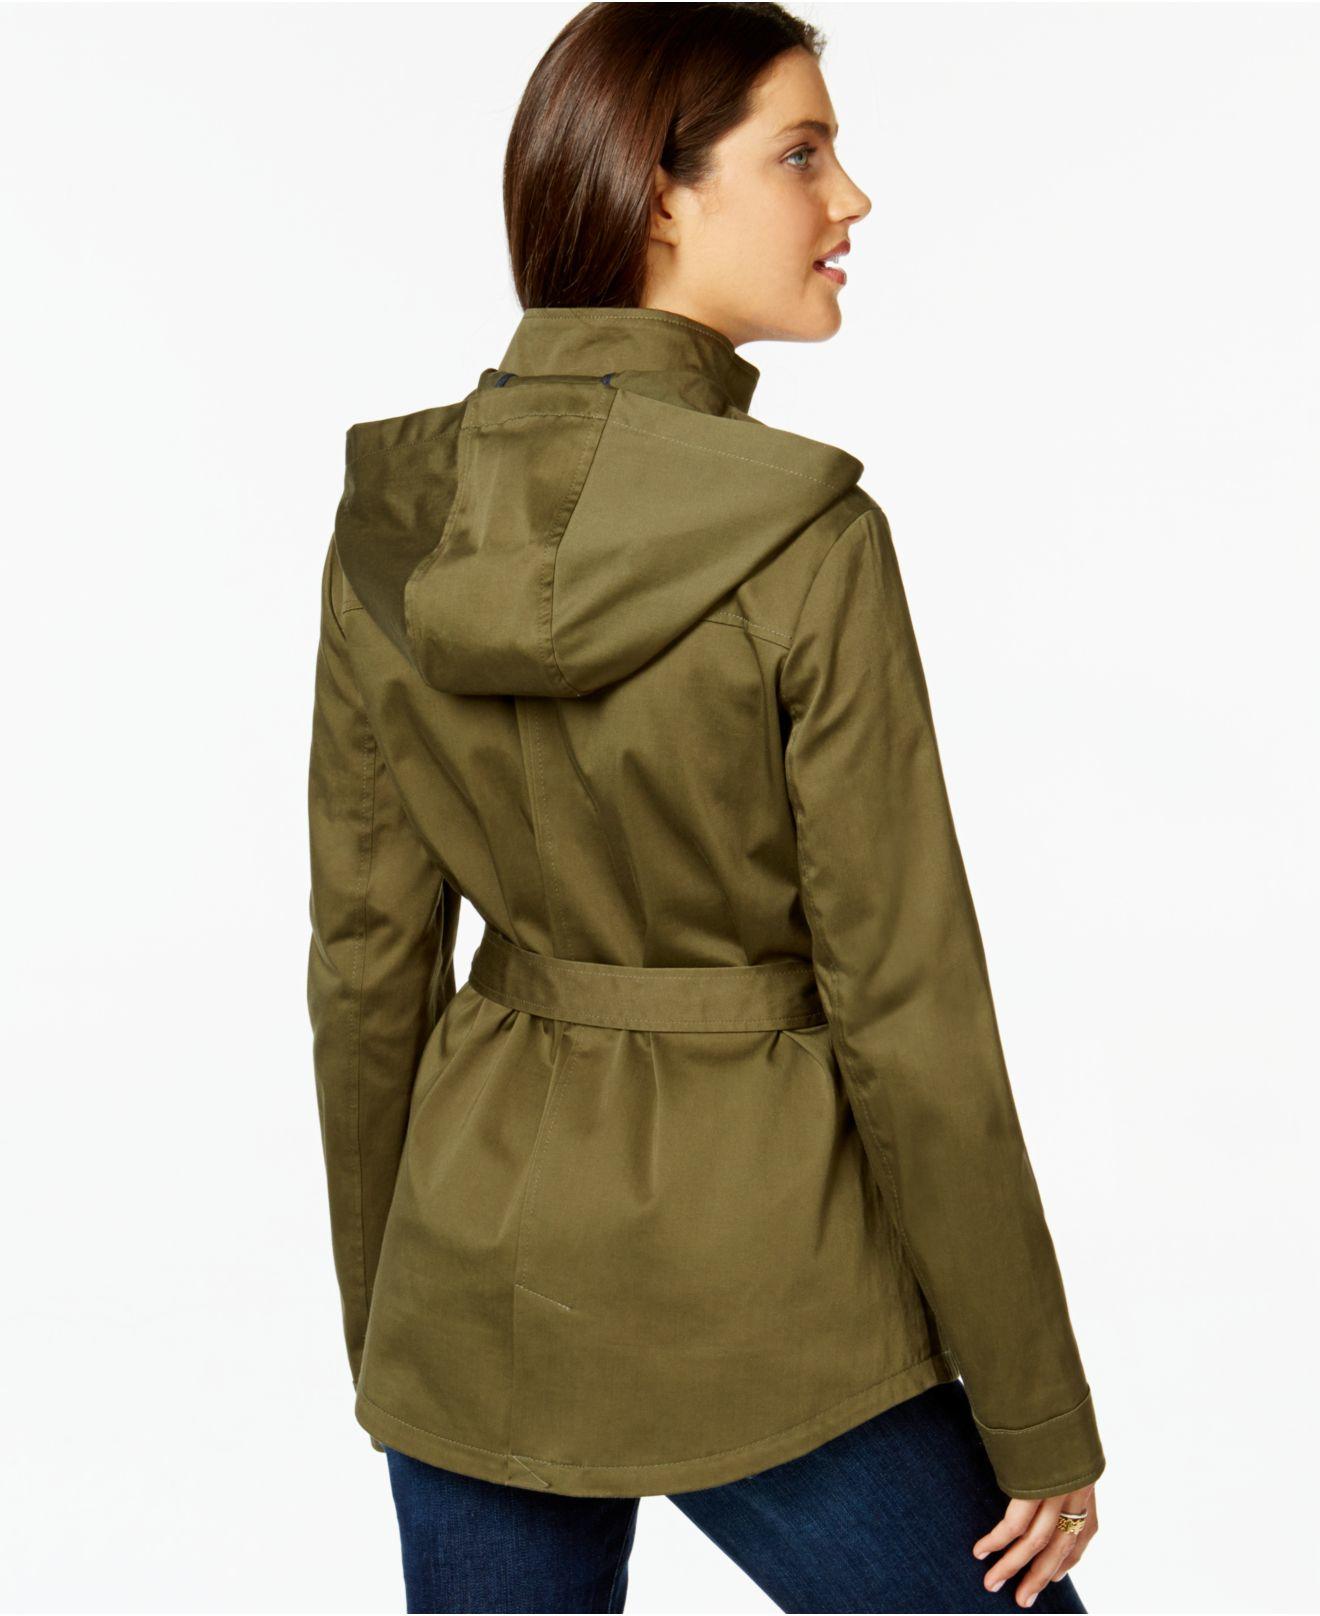 tommy hilfiger sateen utility jacket in green lyst. Black Bedroom Furniture Sets. Home Design Ideas